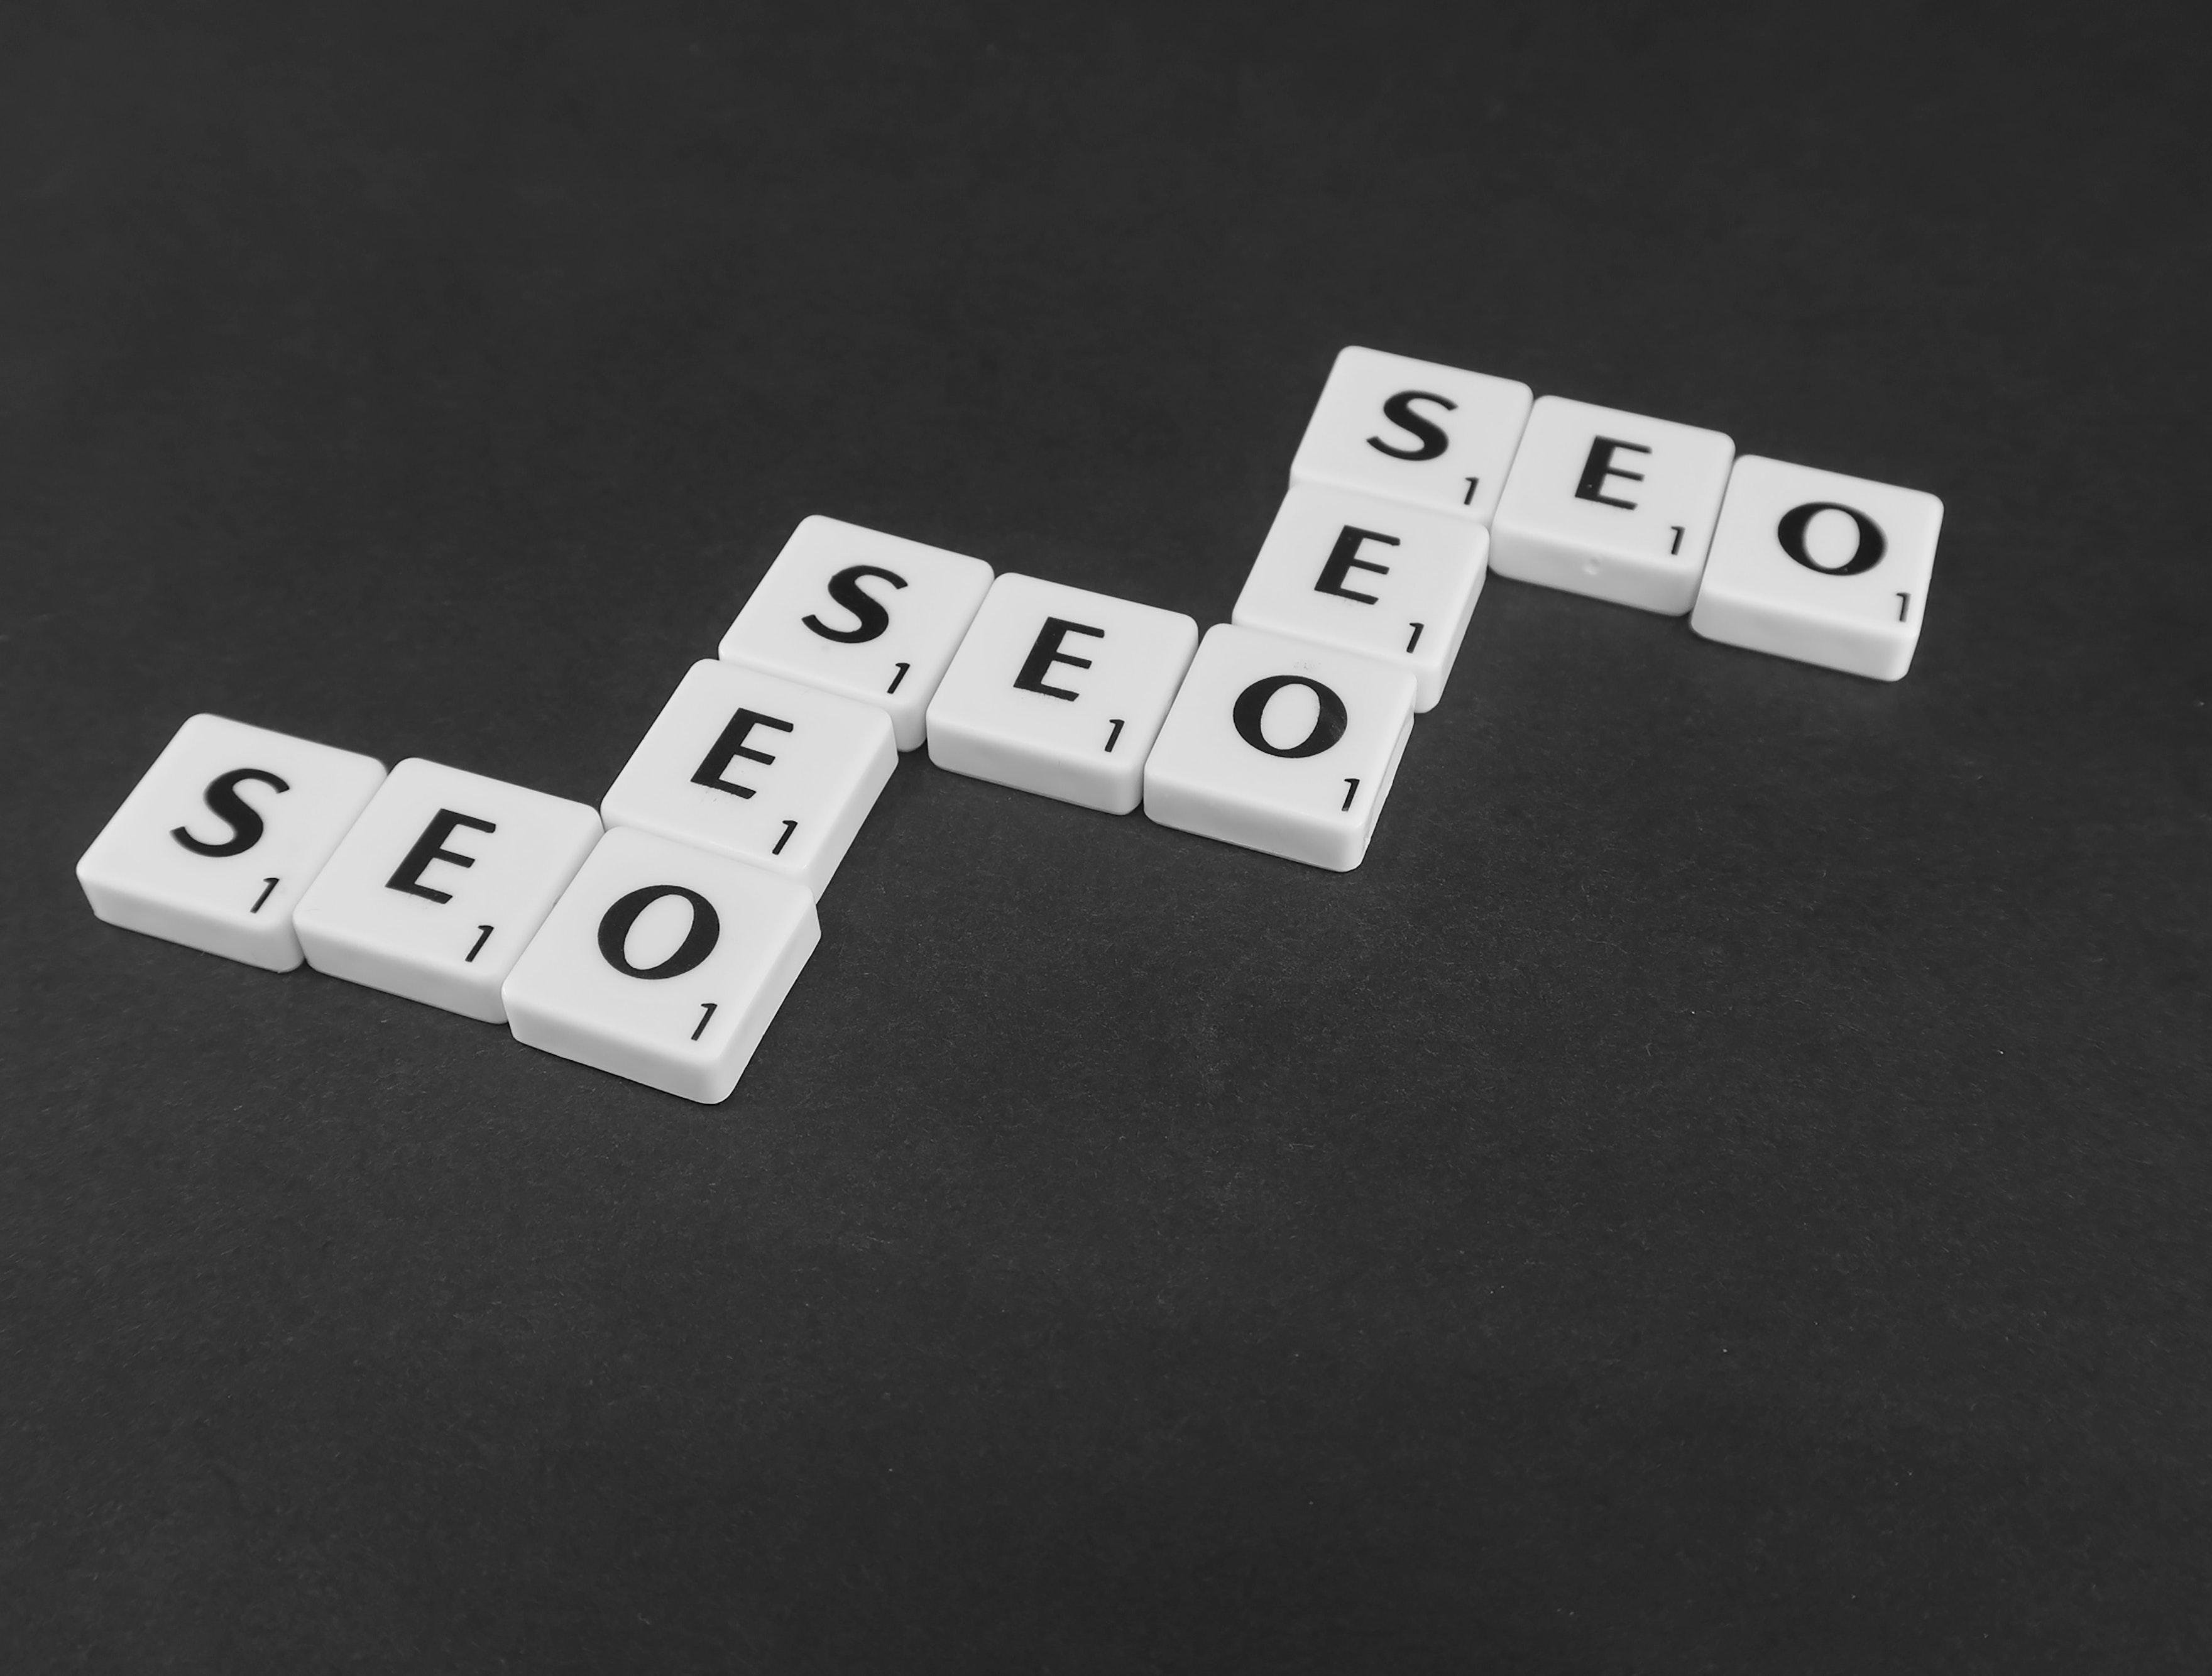 Best Mumbai-Based Digital Marketing Agency With Strong SEO Strategy